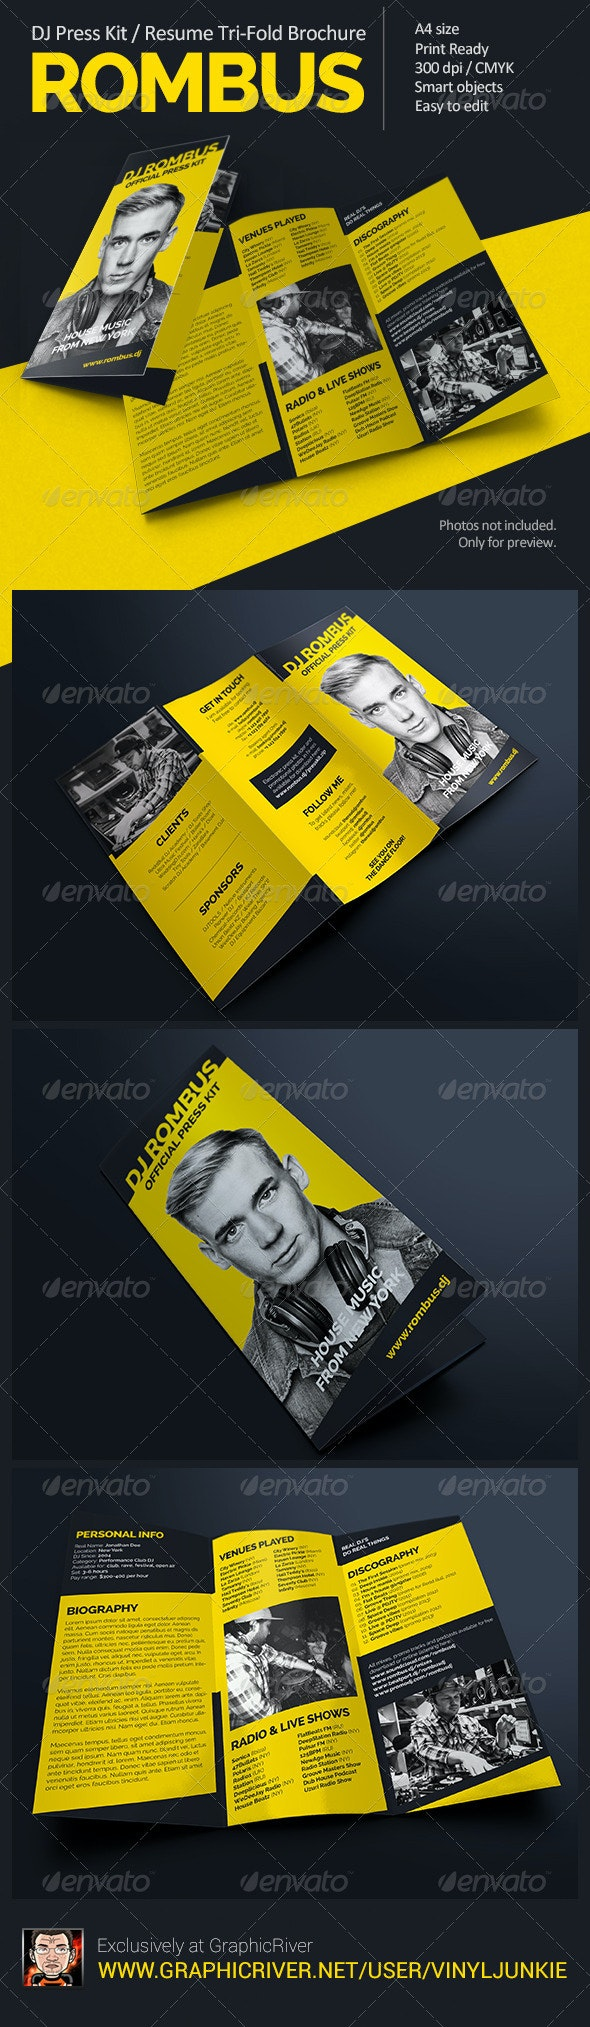 Rombus - DJ Press Kit Tri-Fold Brochure - Portfolio Brochures